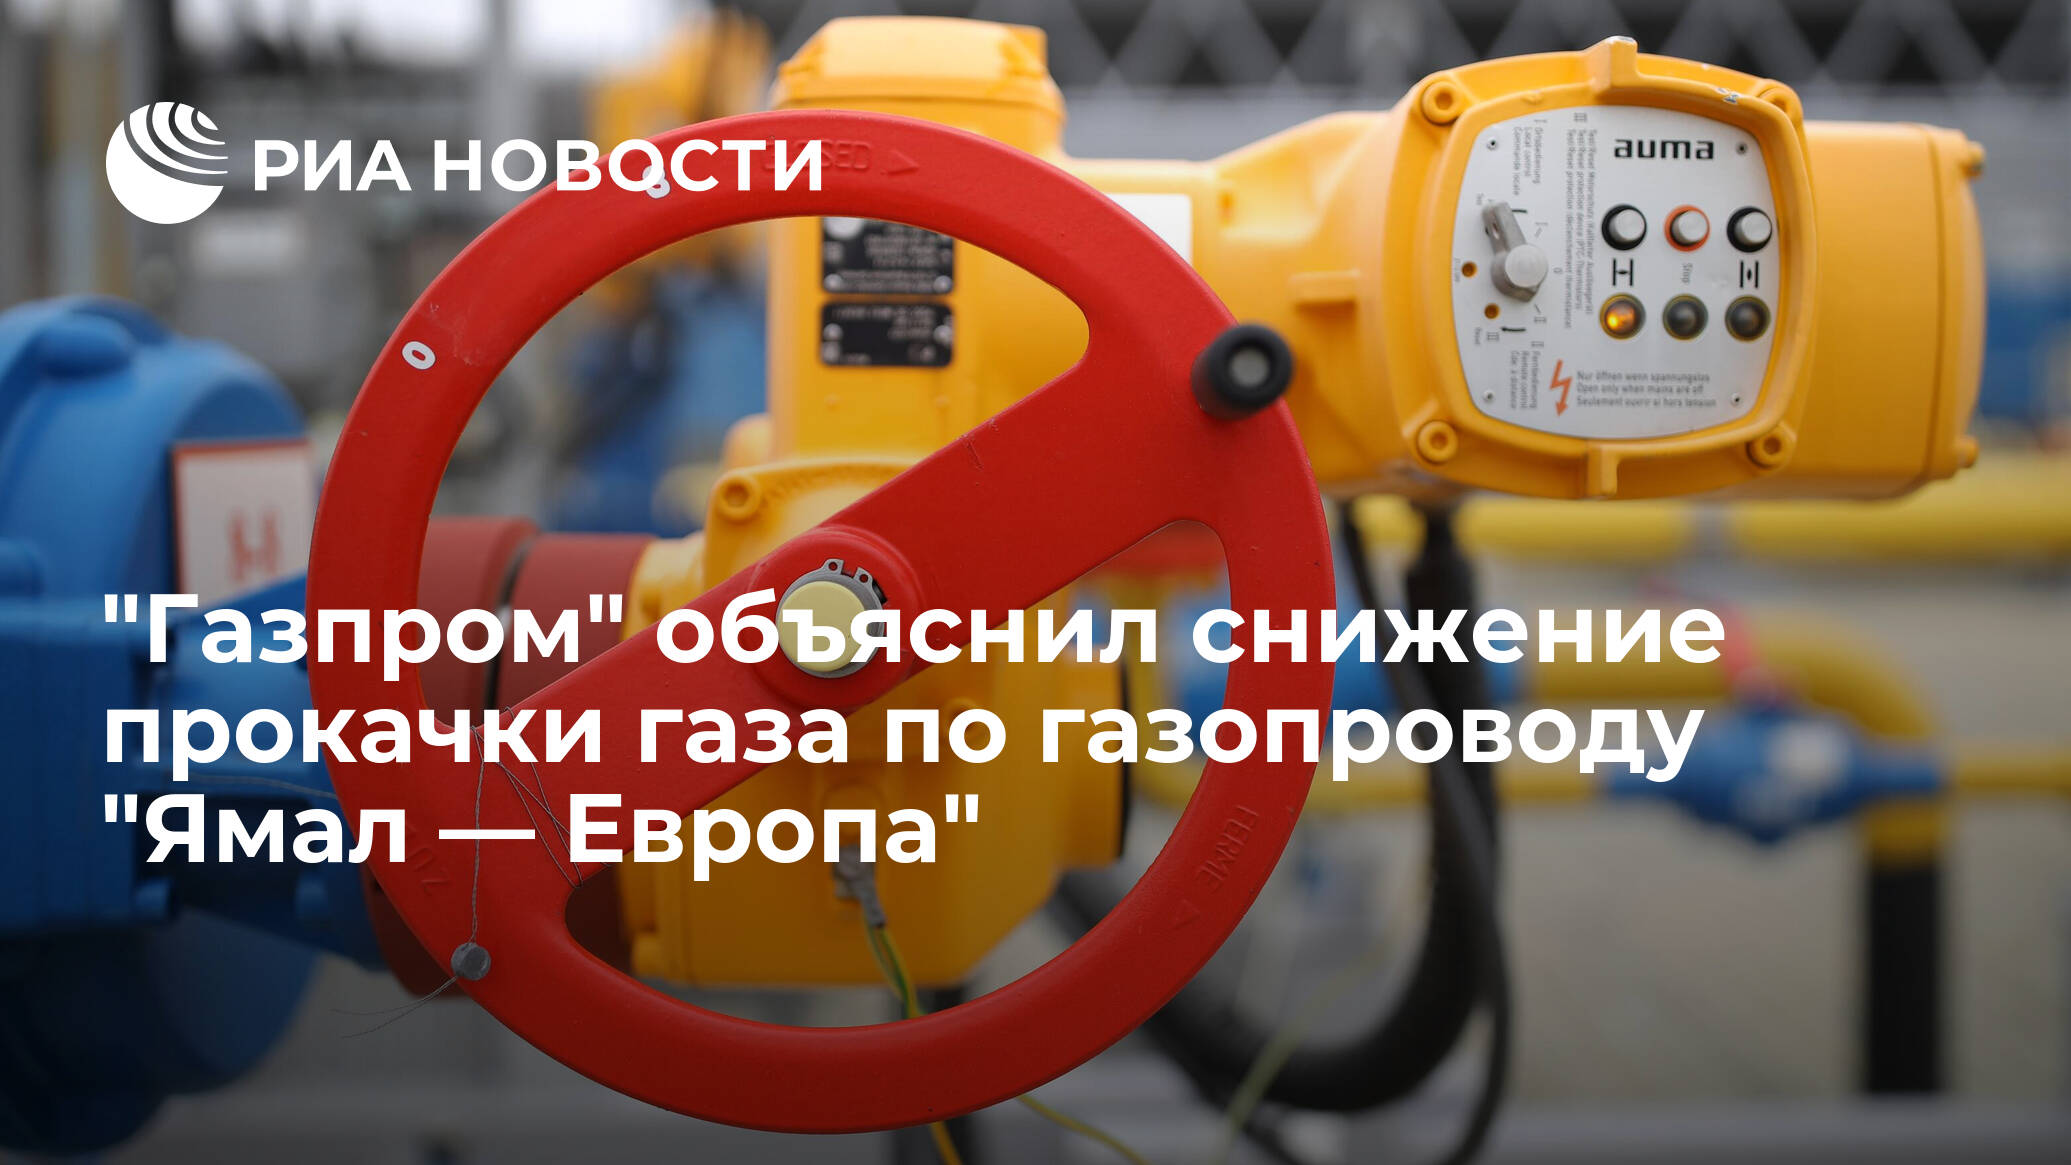 'Газпром' объяснил снижение прокачки газа по газопроводу 'Ямал — Европа' - РИА НОВОСТИ